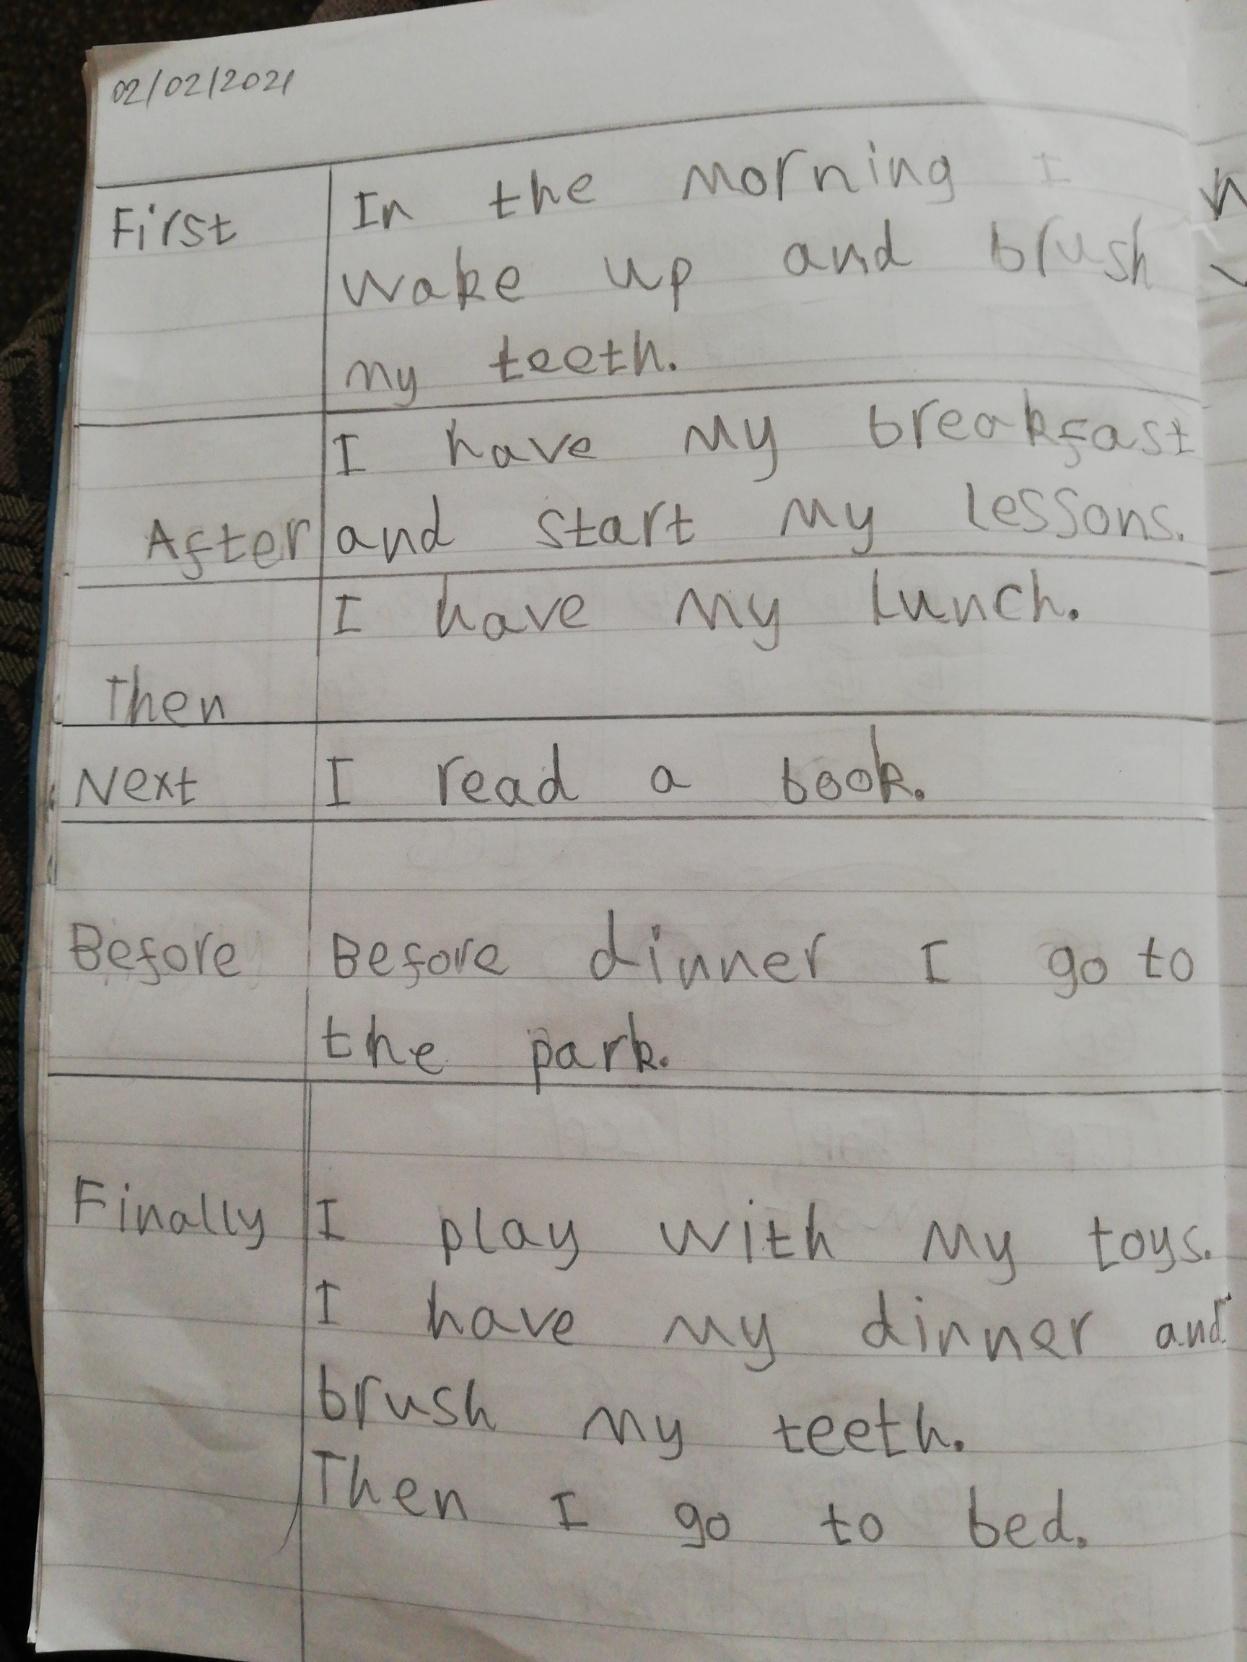 Victoria's beautiful handwriting!